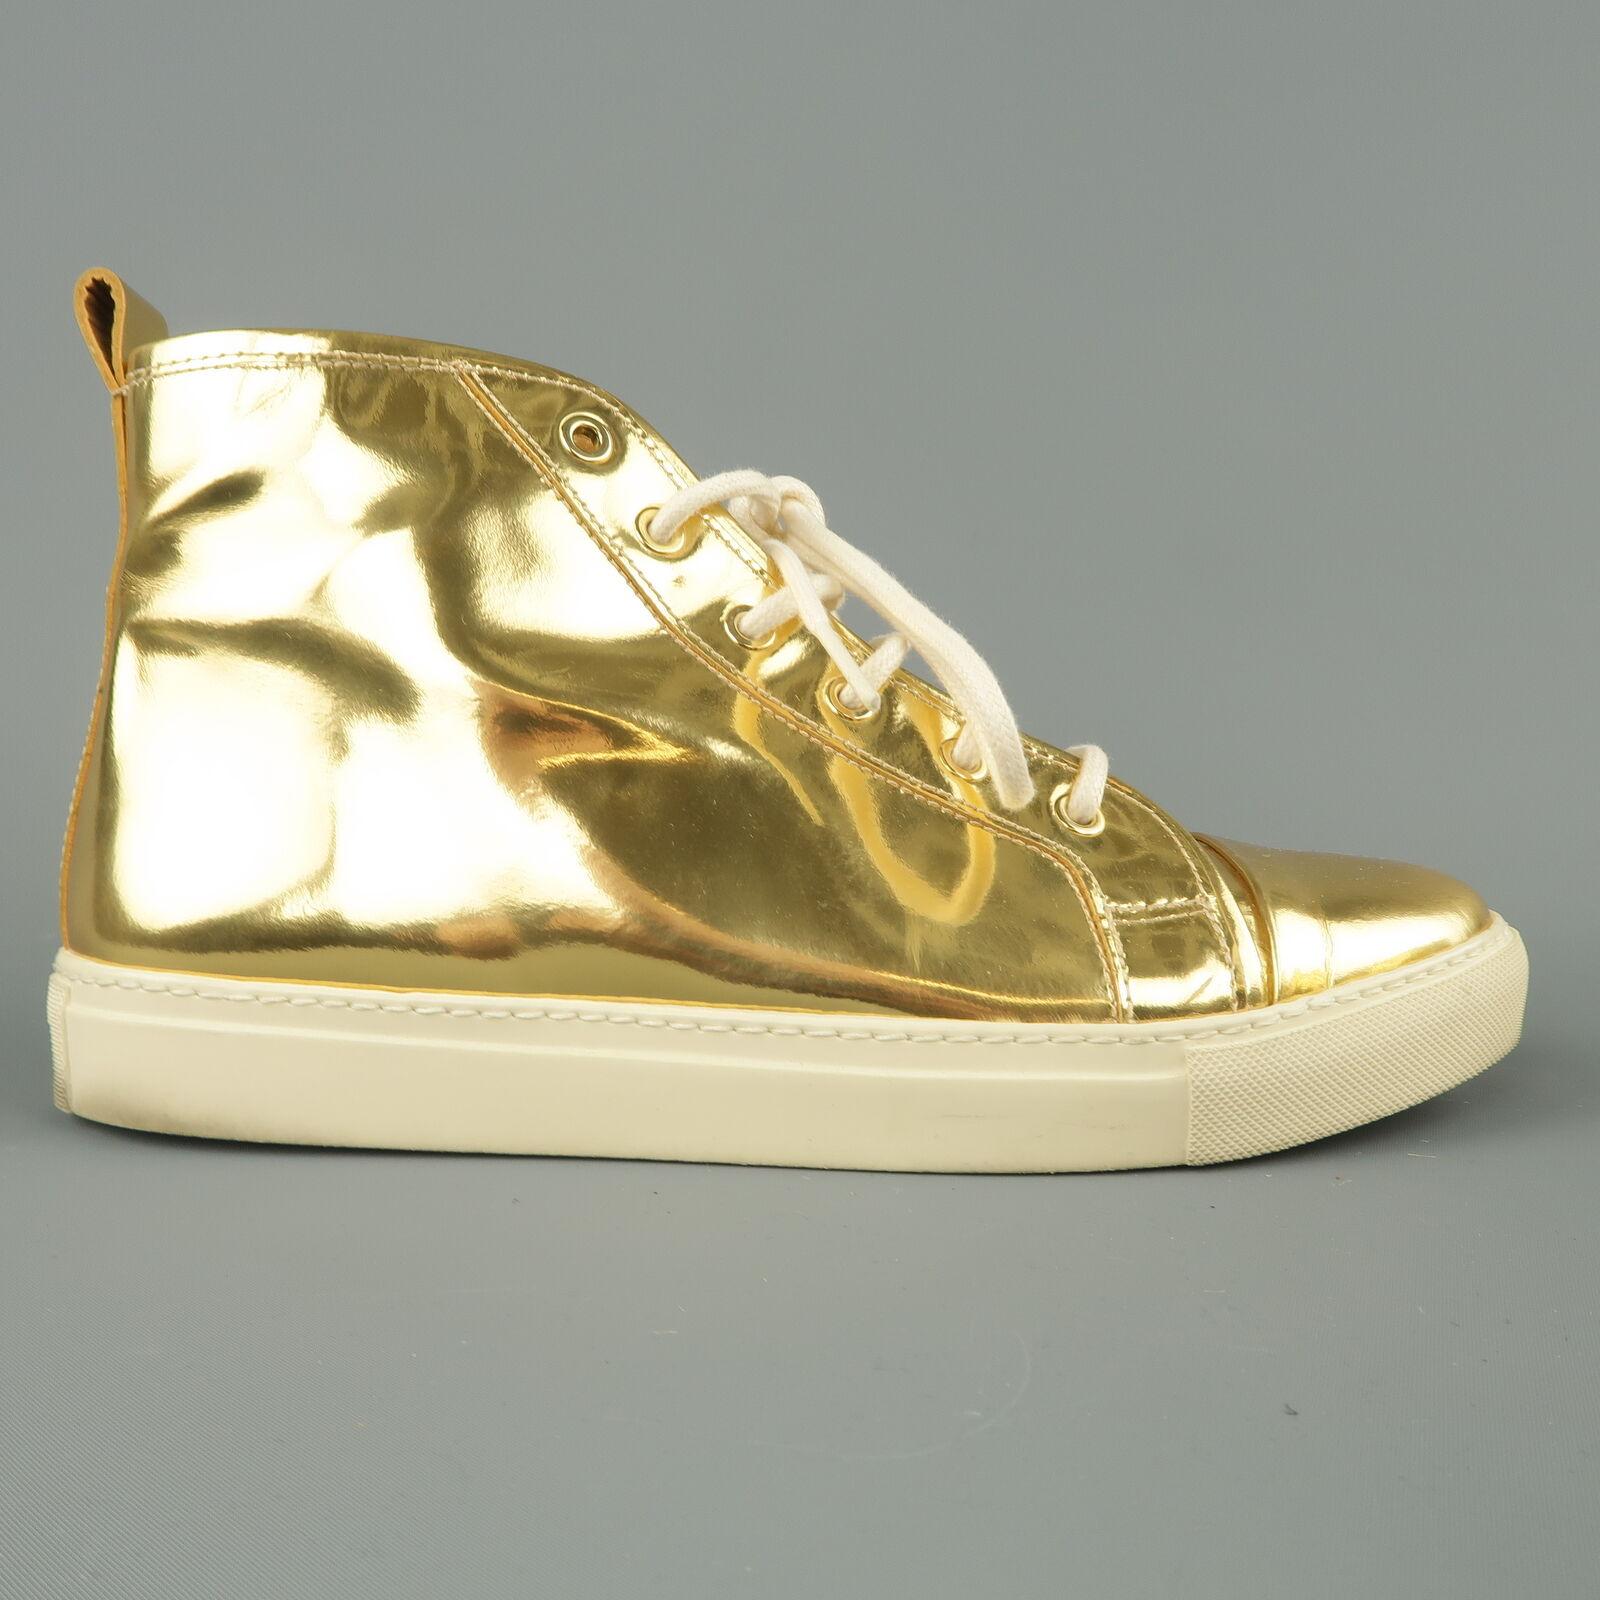 RALPH LAUREN Size 8 Metallic gold Leather Silvana High Top Sneakers